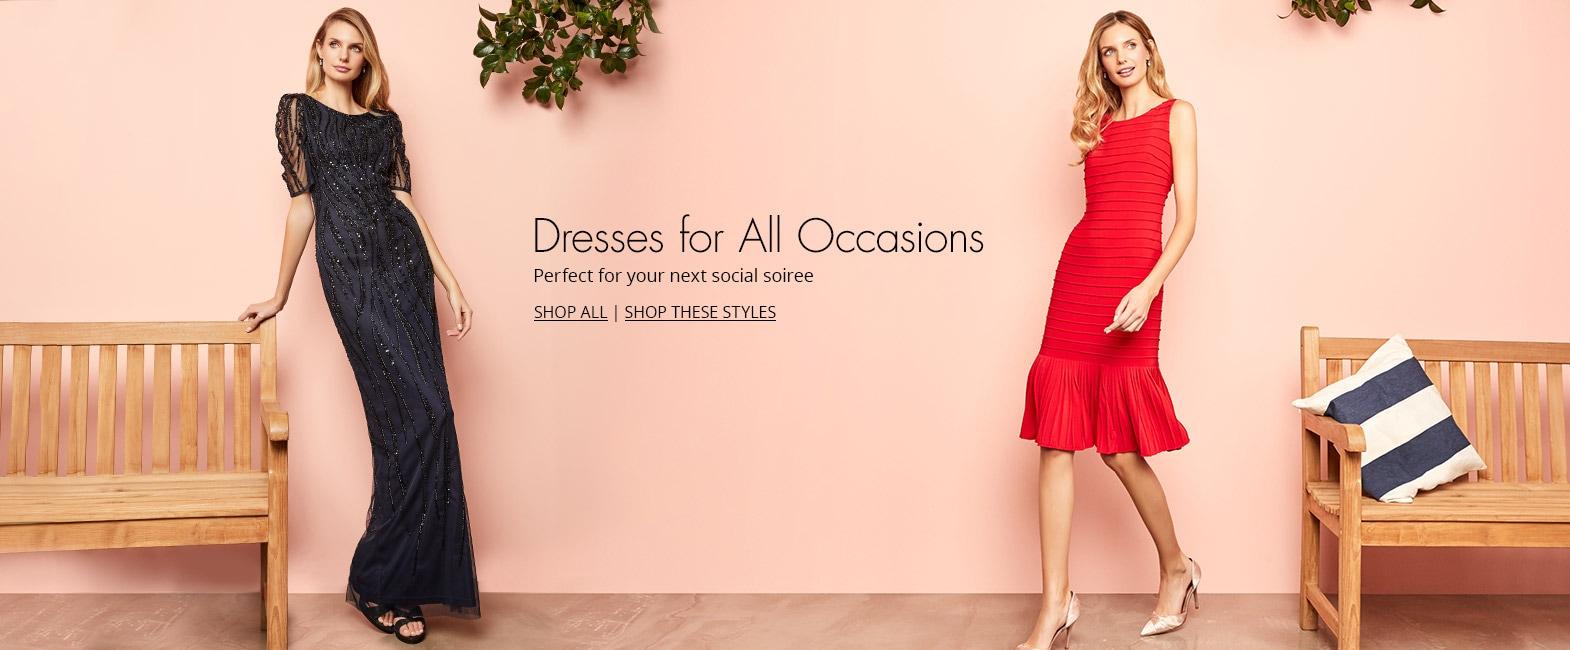 fc11a497a0bc3 Dillard's - Official Site of Dillard's Department Stores - Dillards ...